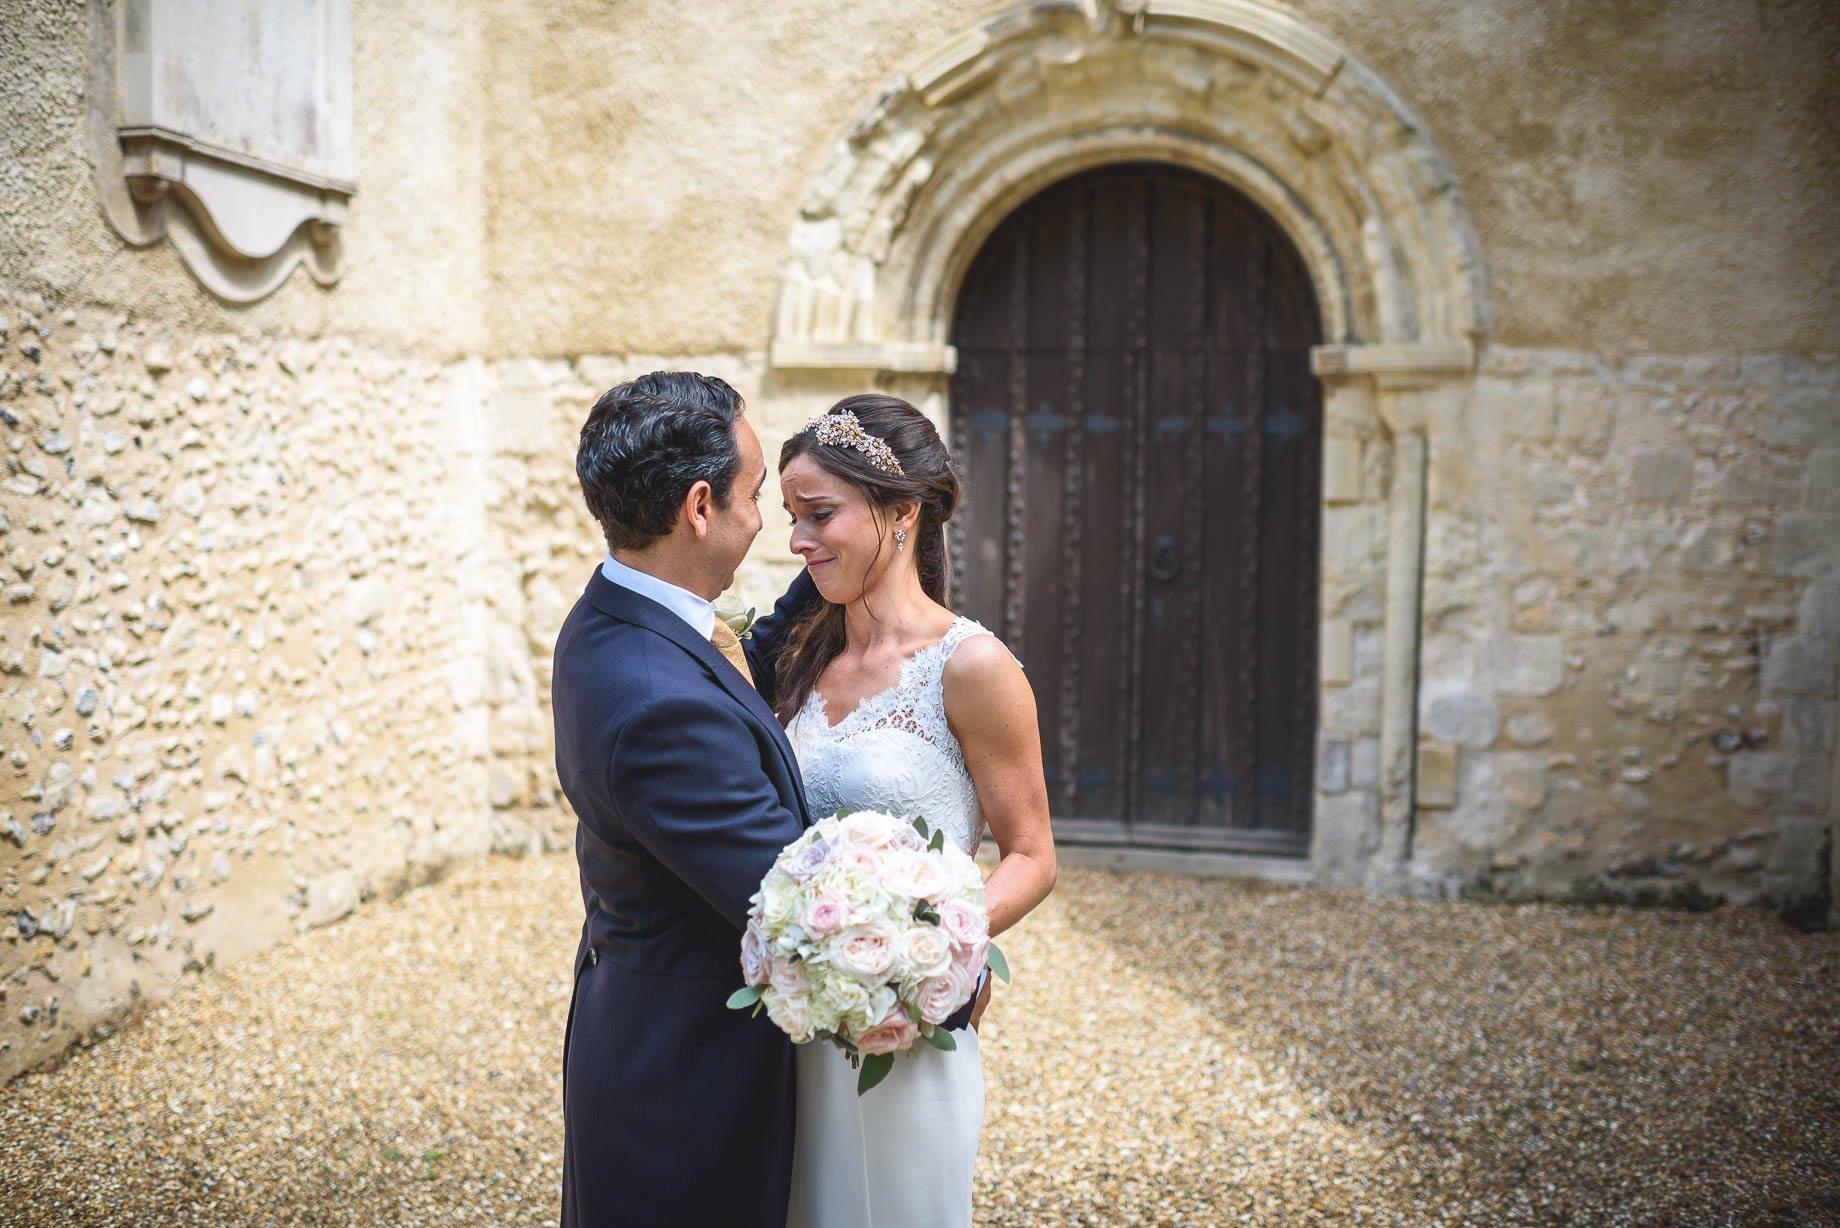 Bury Court Barn Wedding Photography - Caroline and Rob (73 of 219)